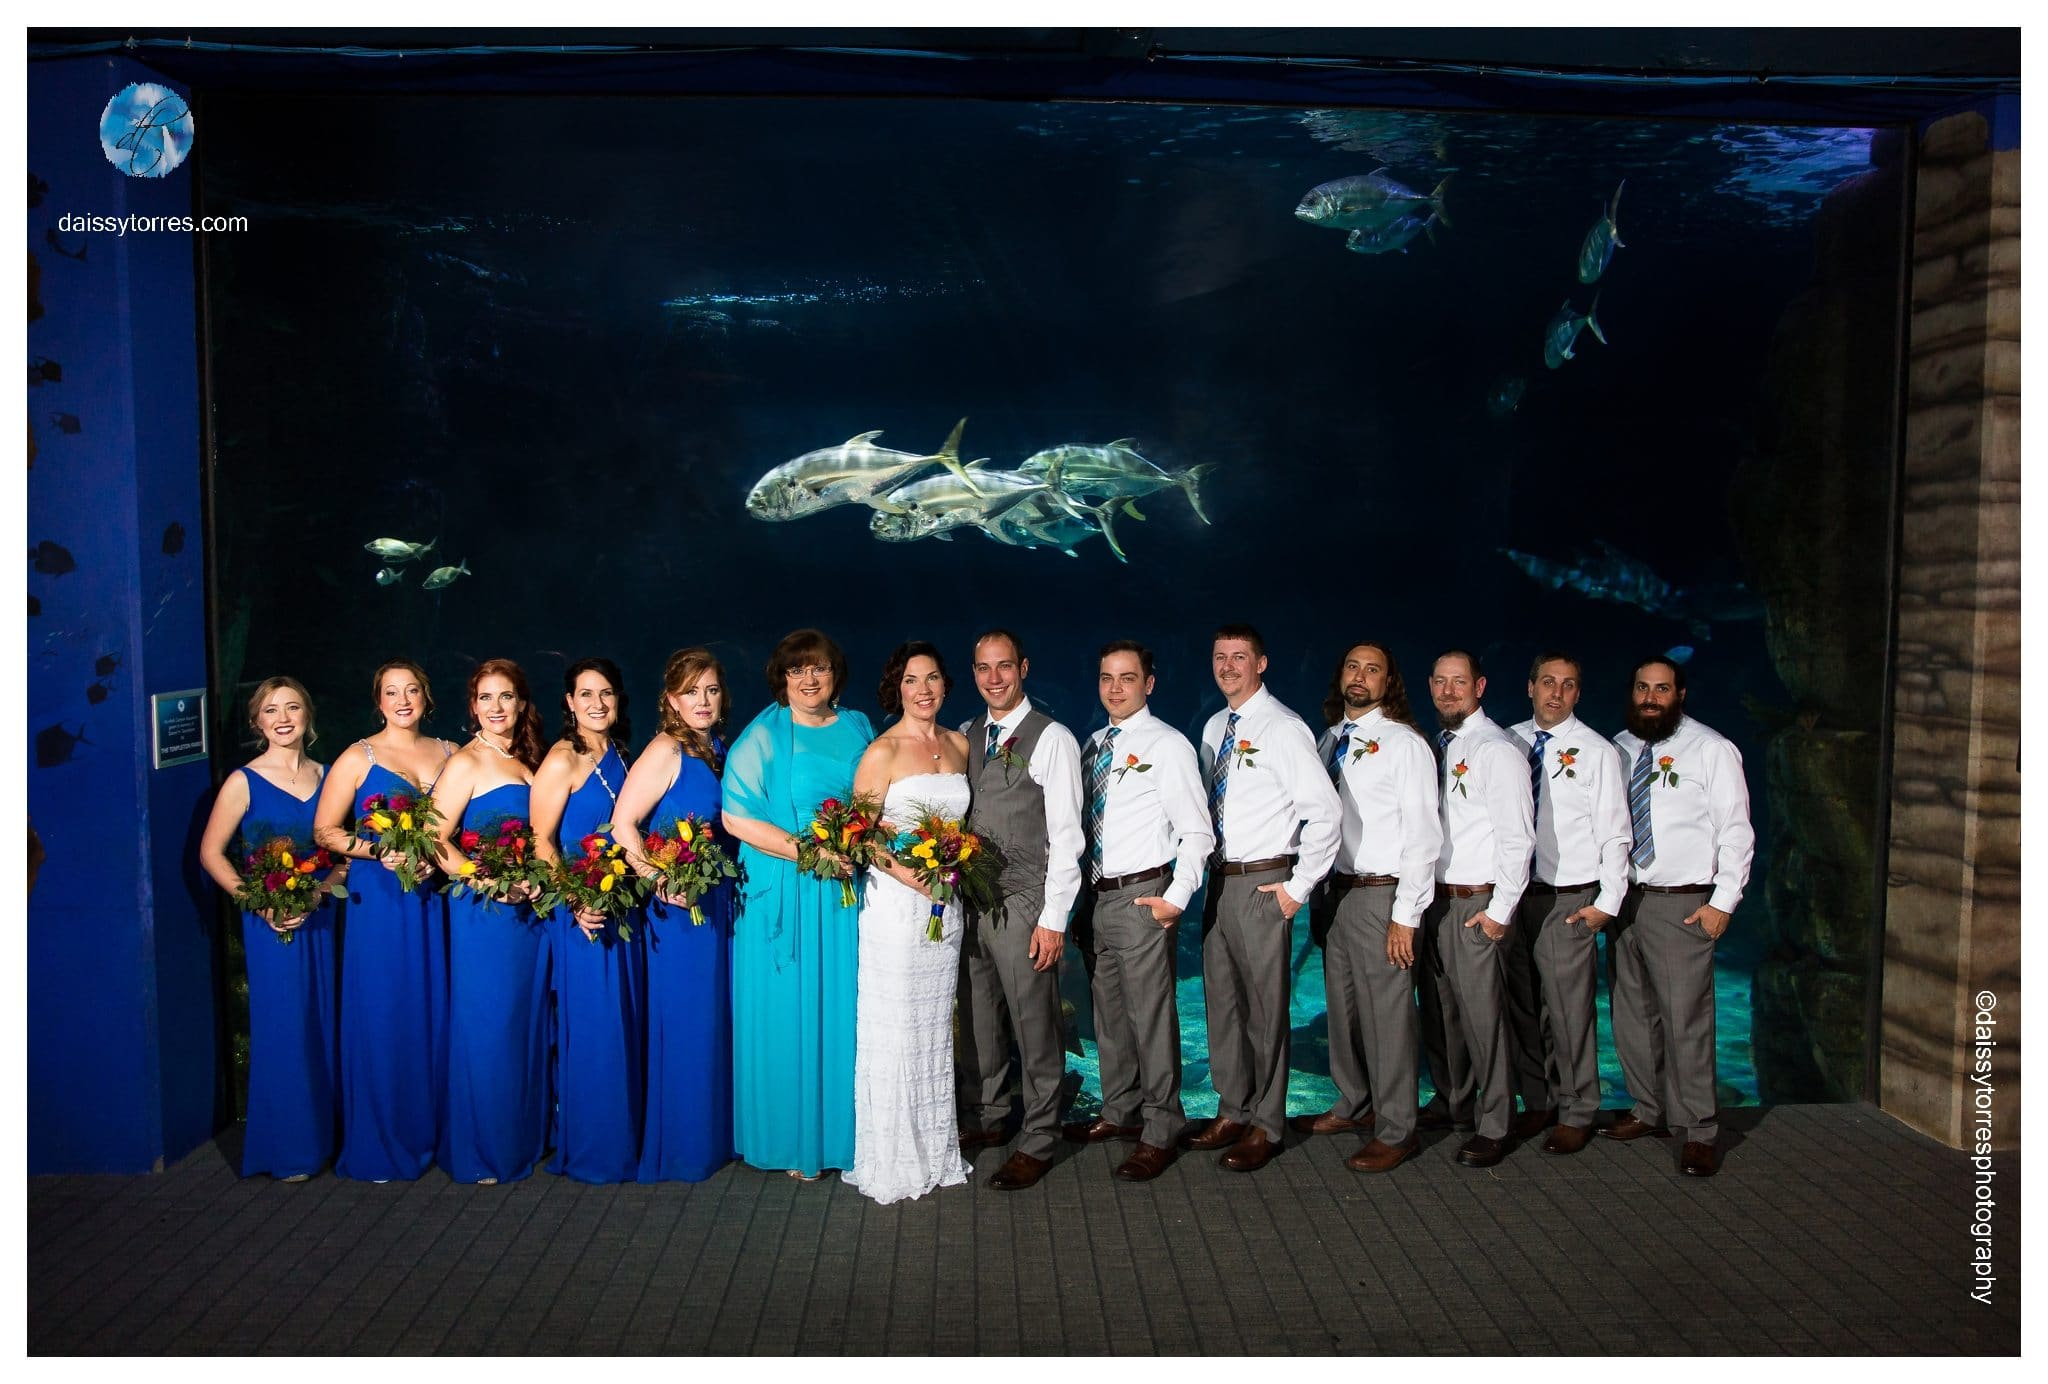 Virginia Aquarium Wedding - Shark Tank bridal party